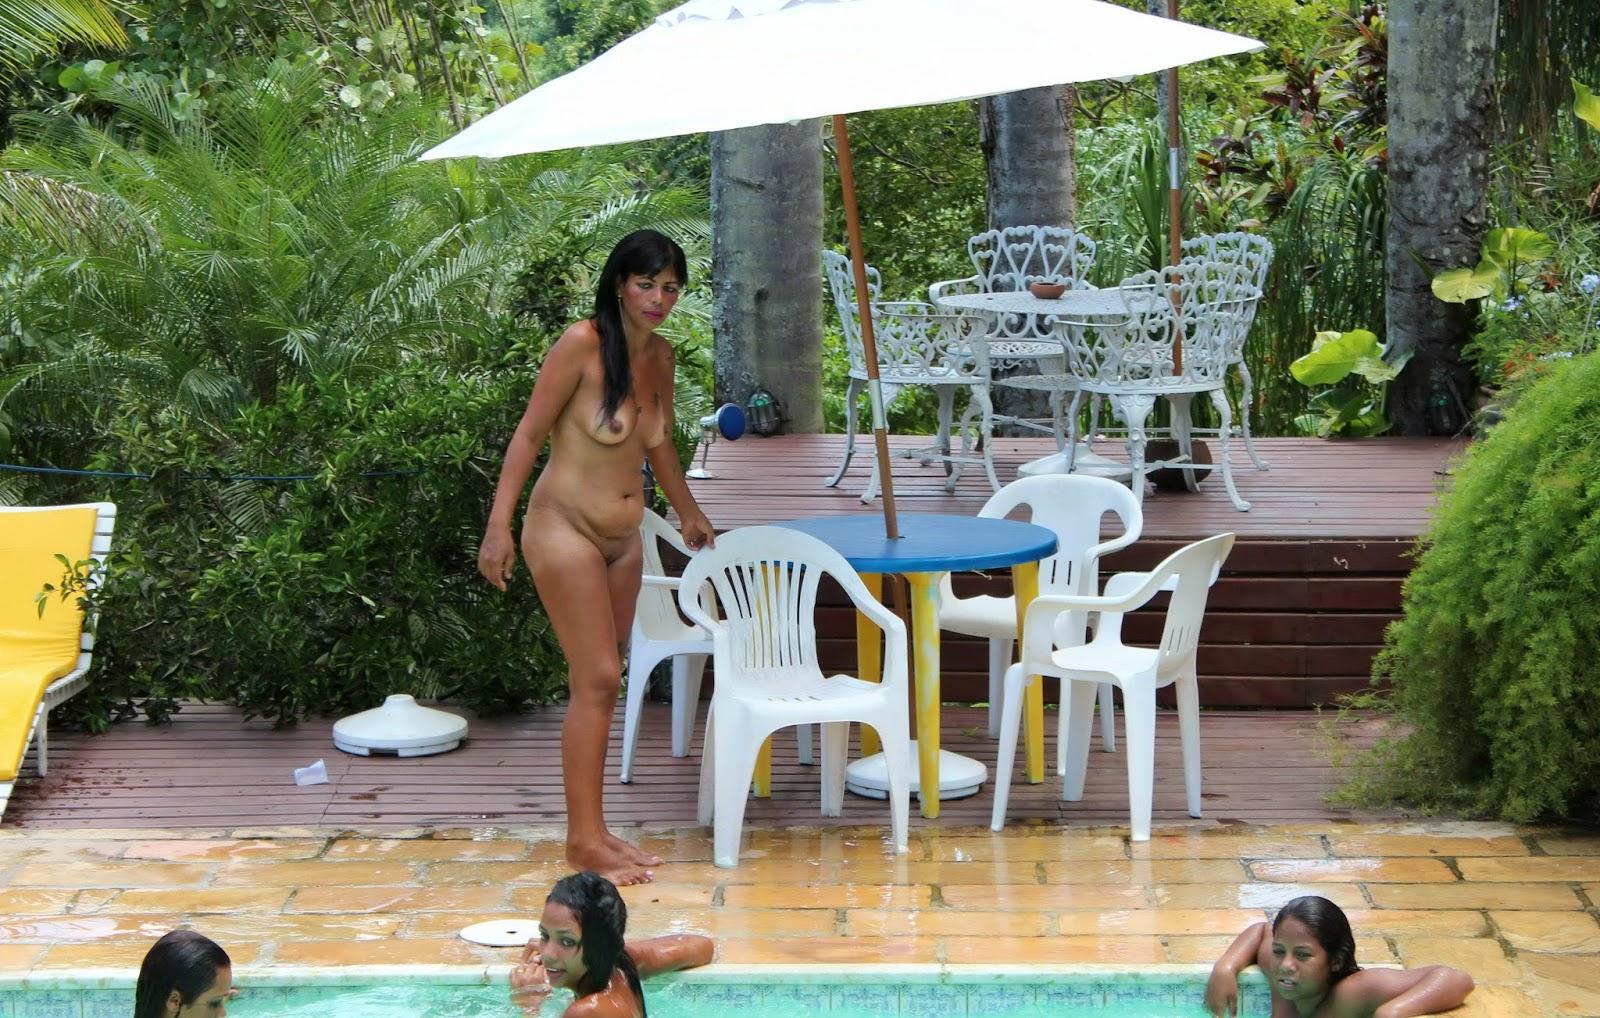 Maroko girl naked picture